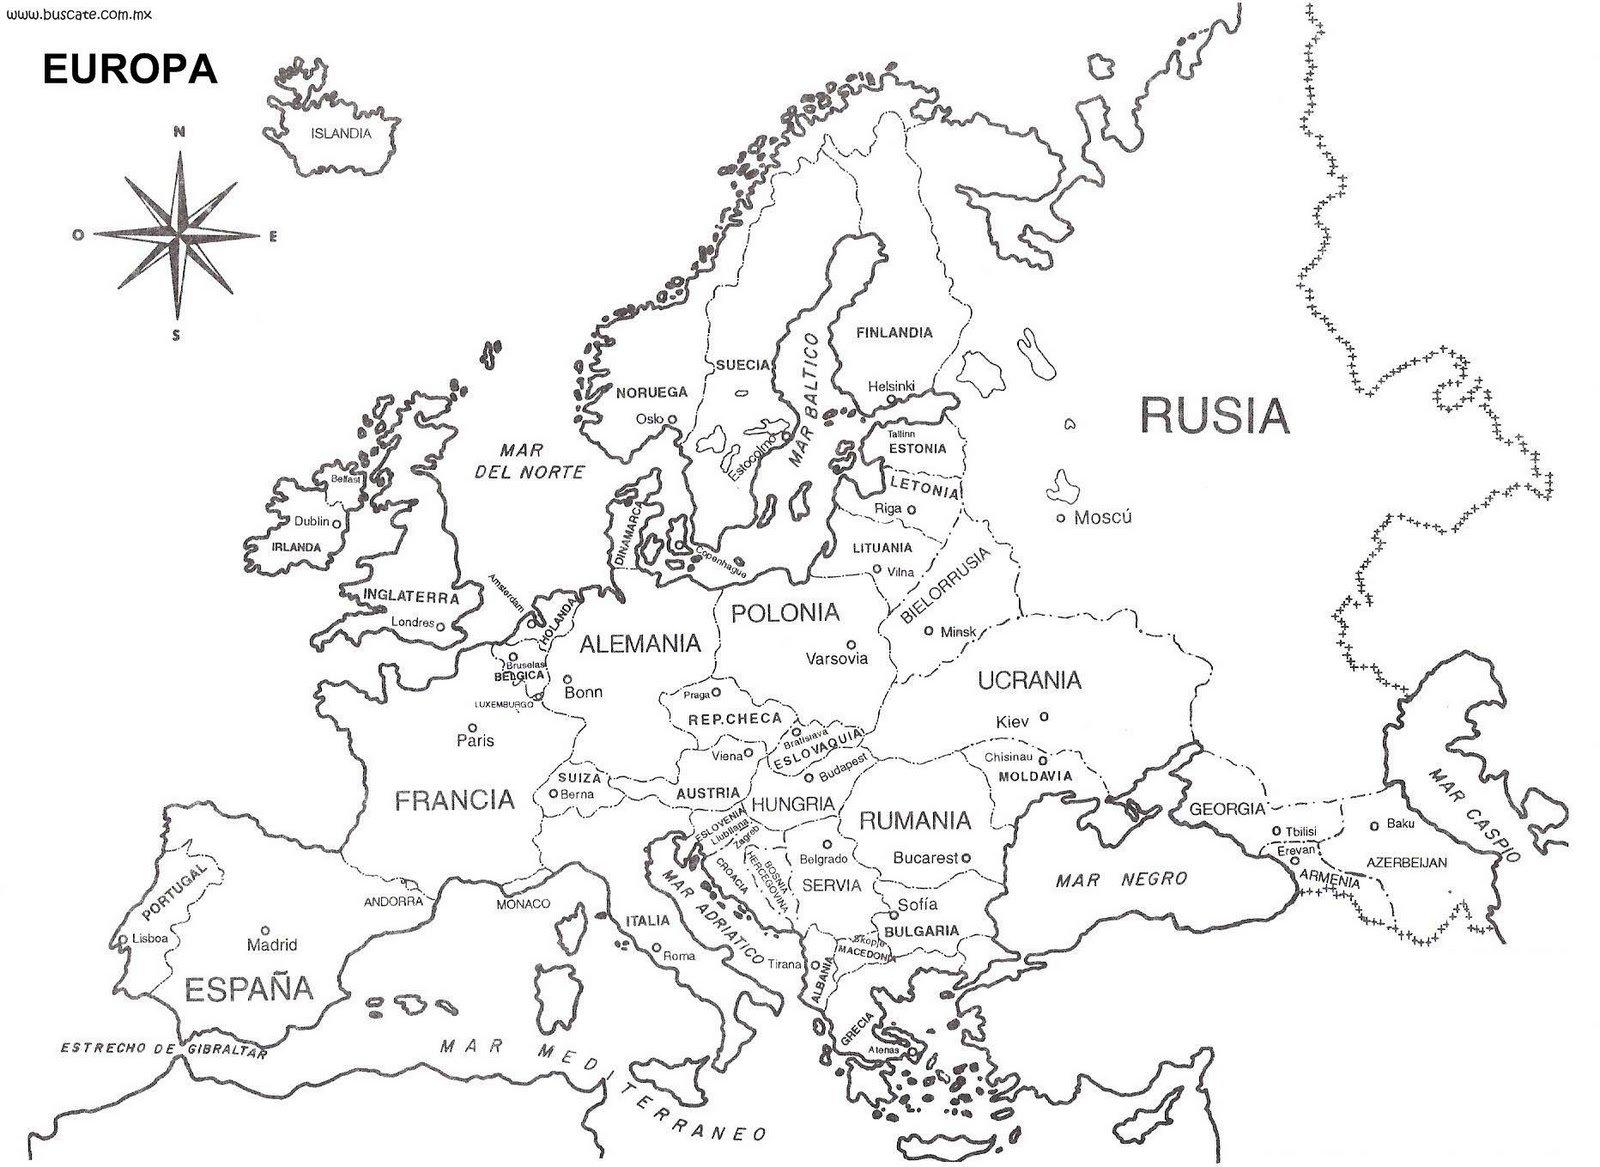 mapa da europa para pintar Mapa Da Europa Para Pintar mapa da europa para pintar